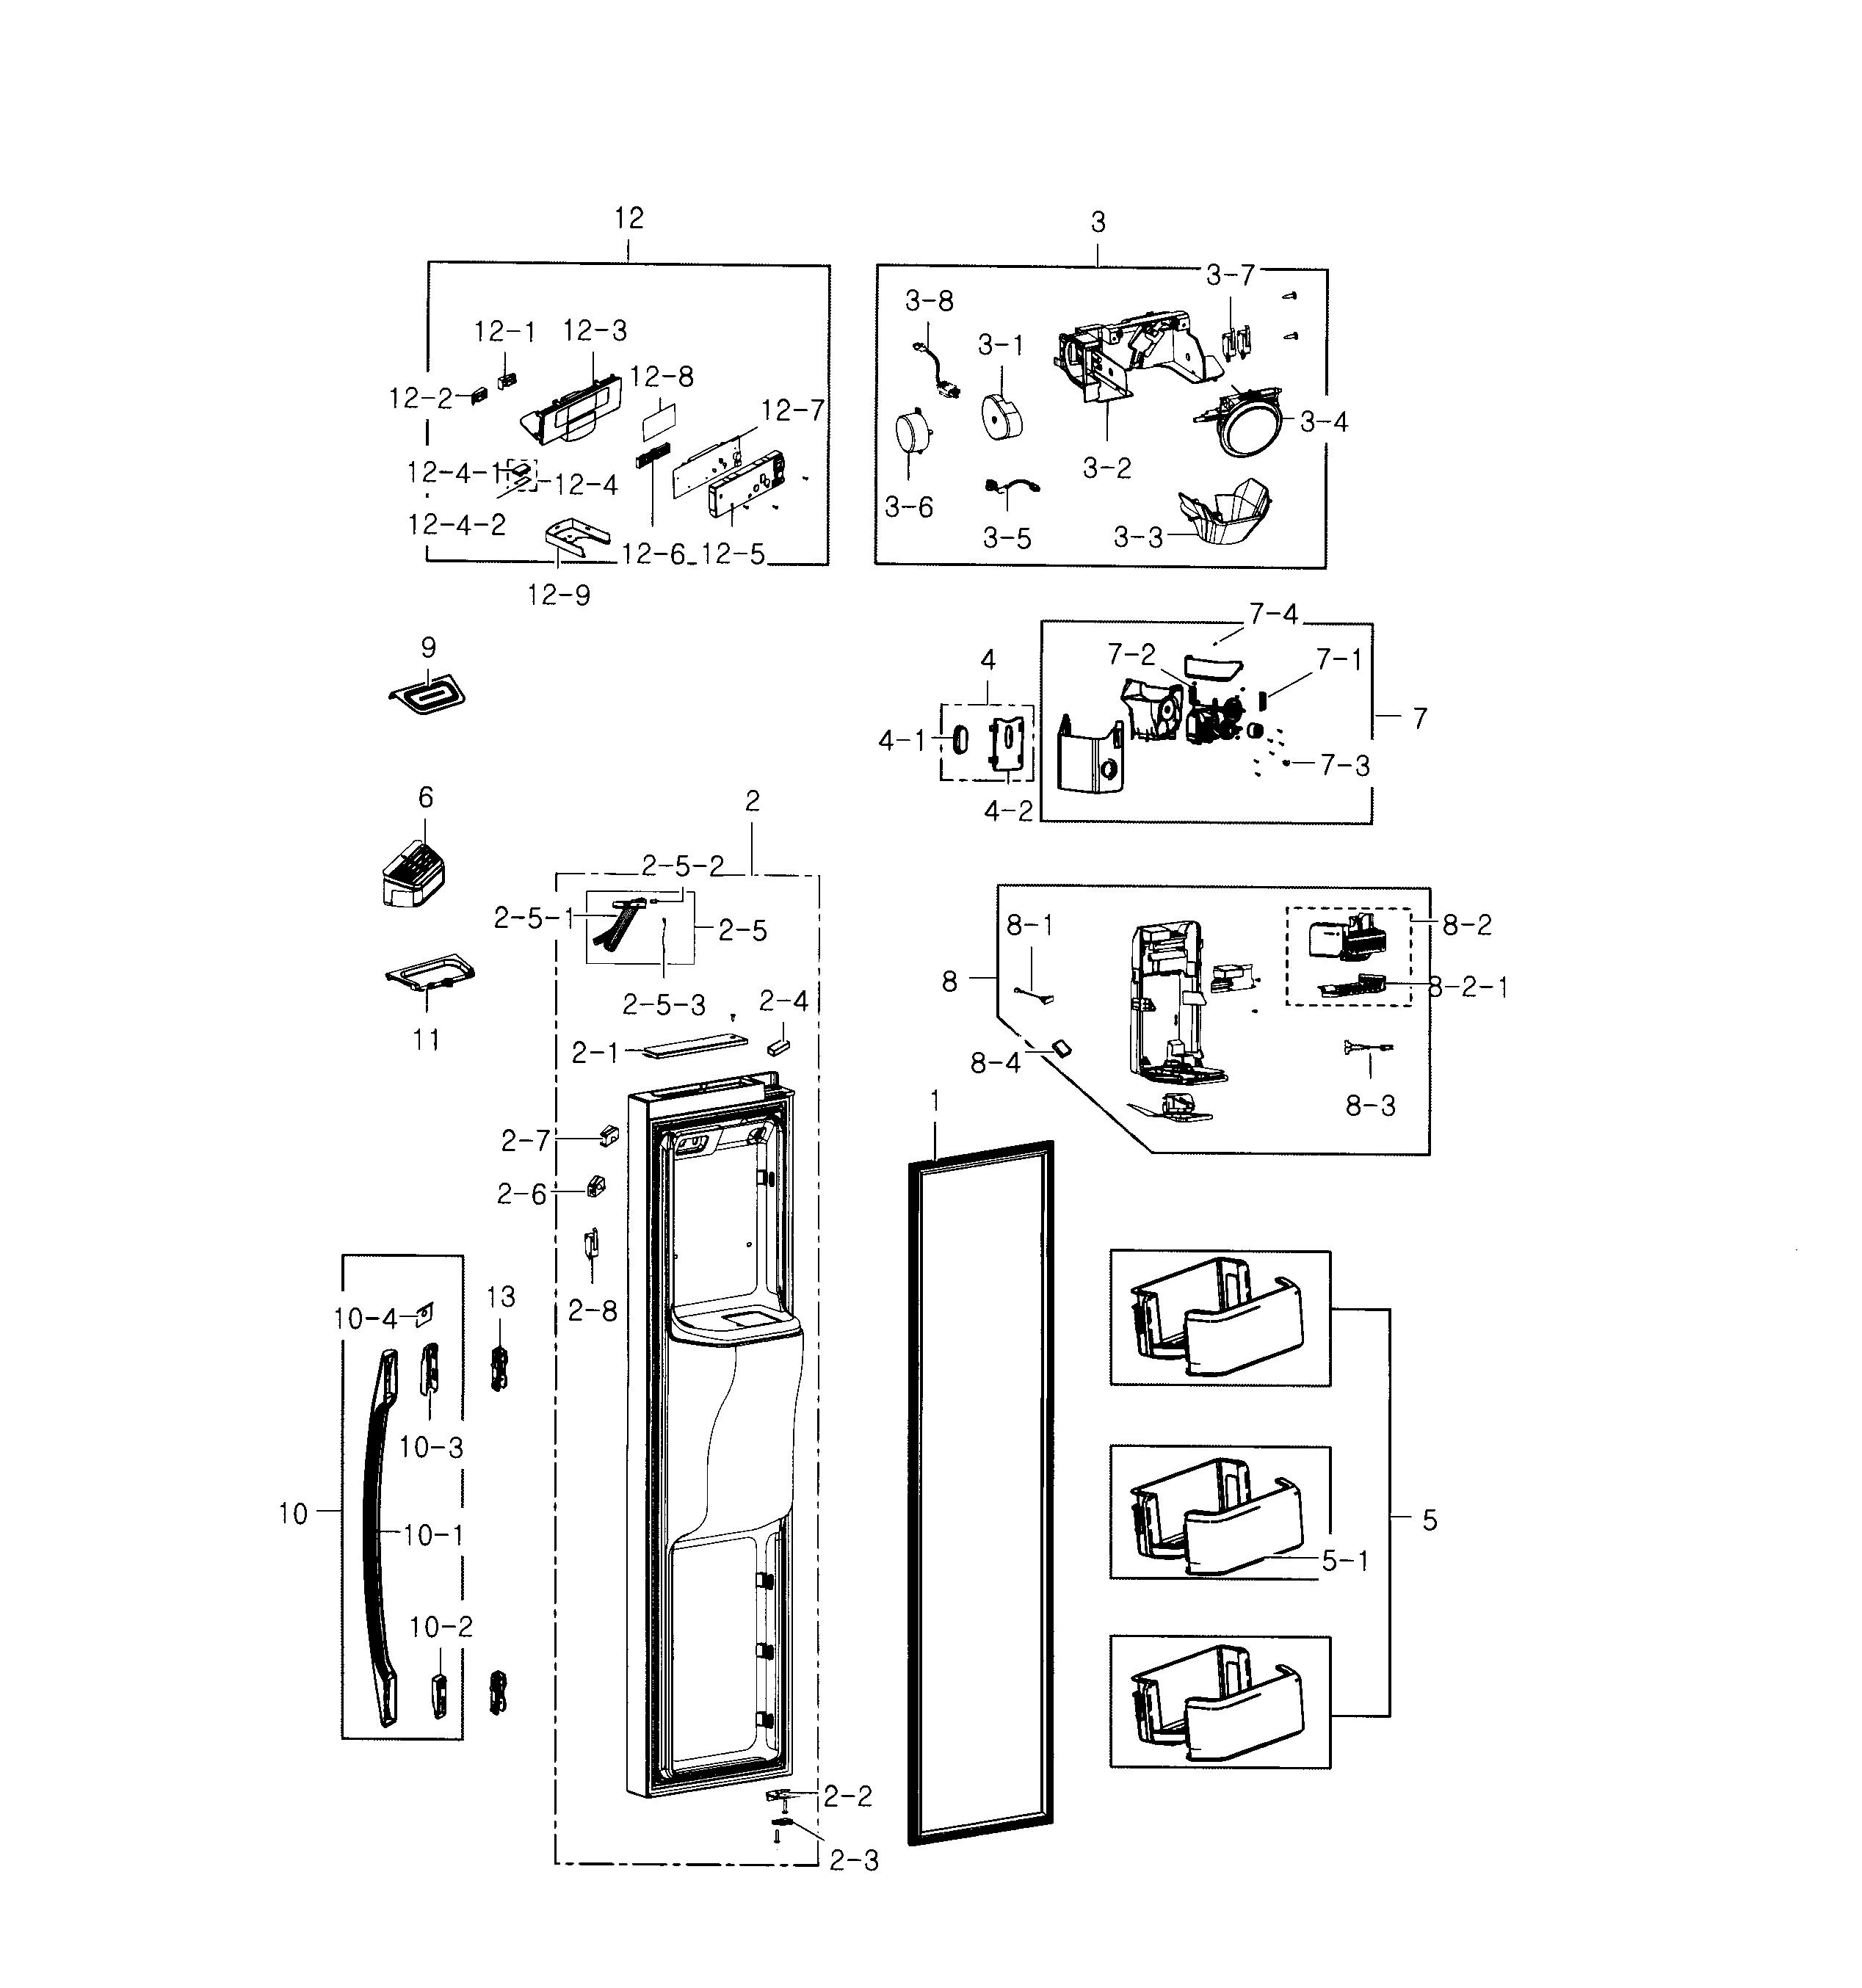 Samsung Refrigerator Wiring Diagram : 35 Wiring Diagram